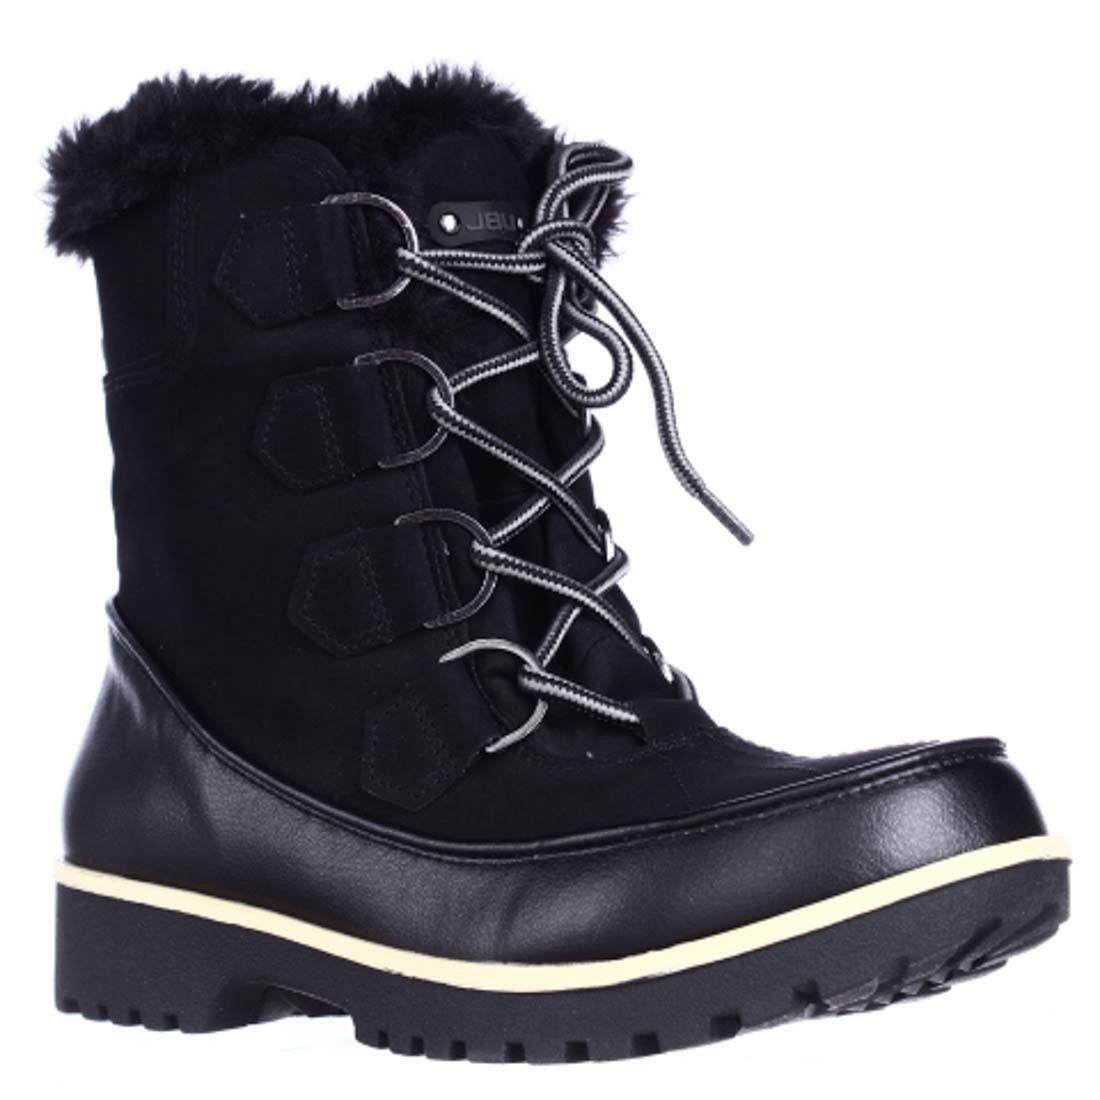 JBU by Jambu Mendocino Mid Calf Faux Fur Winter Snow Boots, Black, 6.5 US / 36.5 EU